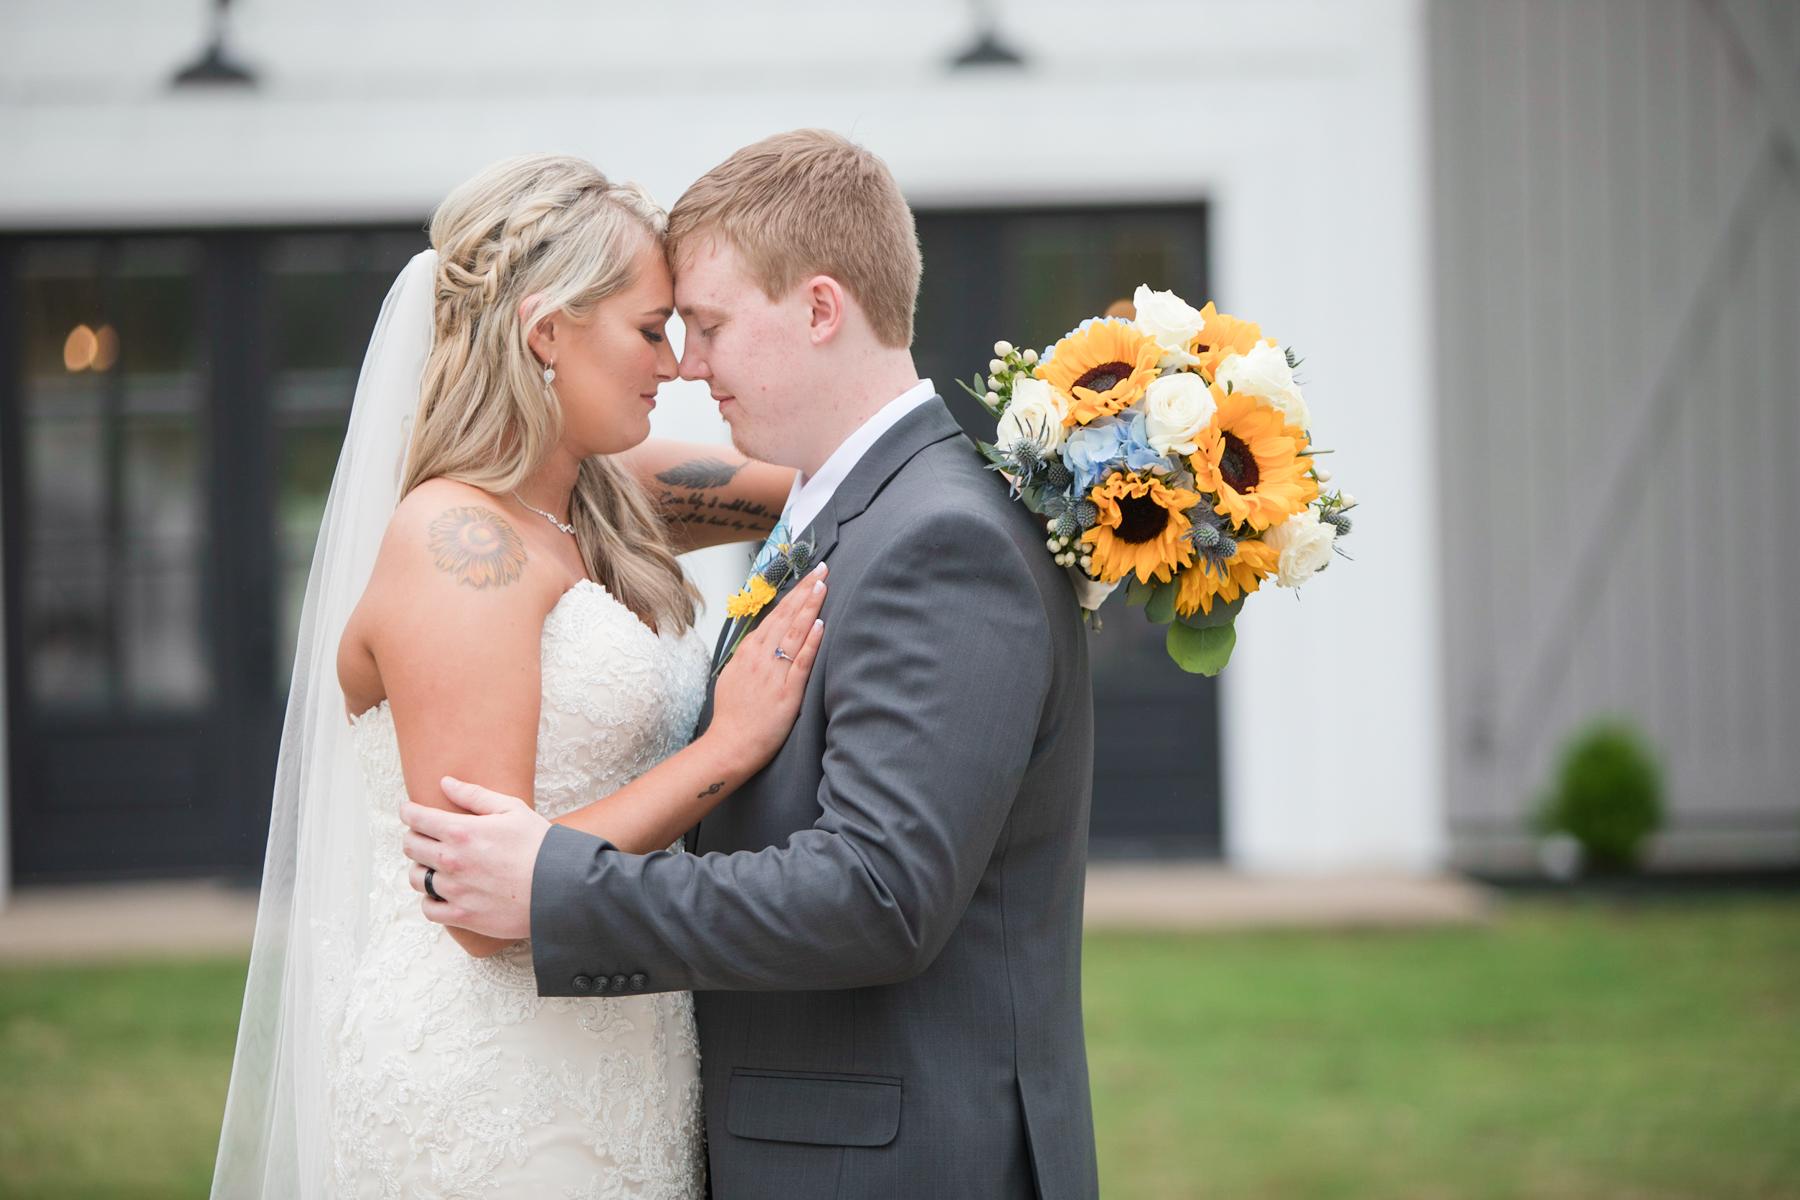 The-venue-at-white-oak-farms-wedding-nashville-wedding-photographers-0197.jpg